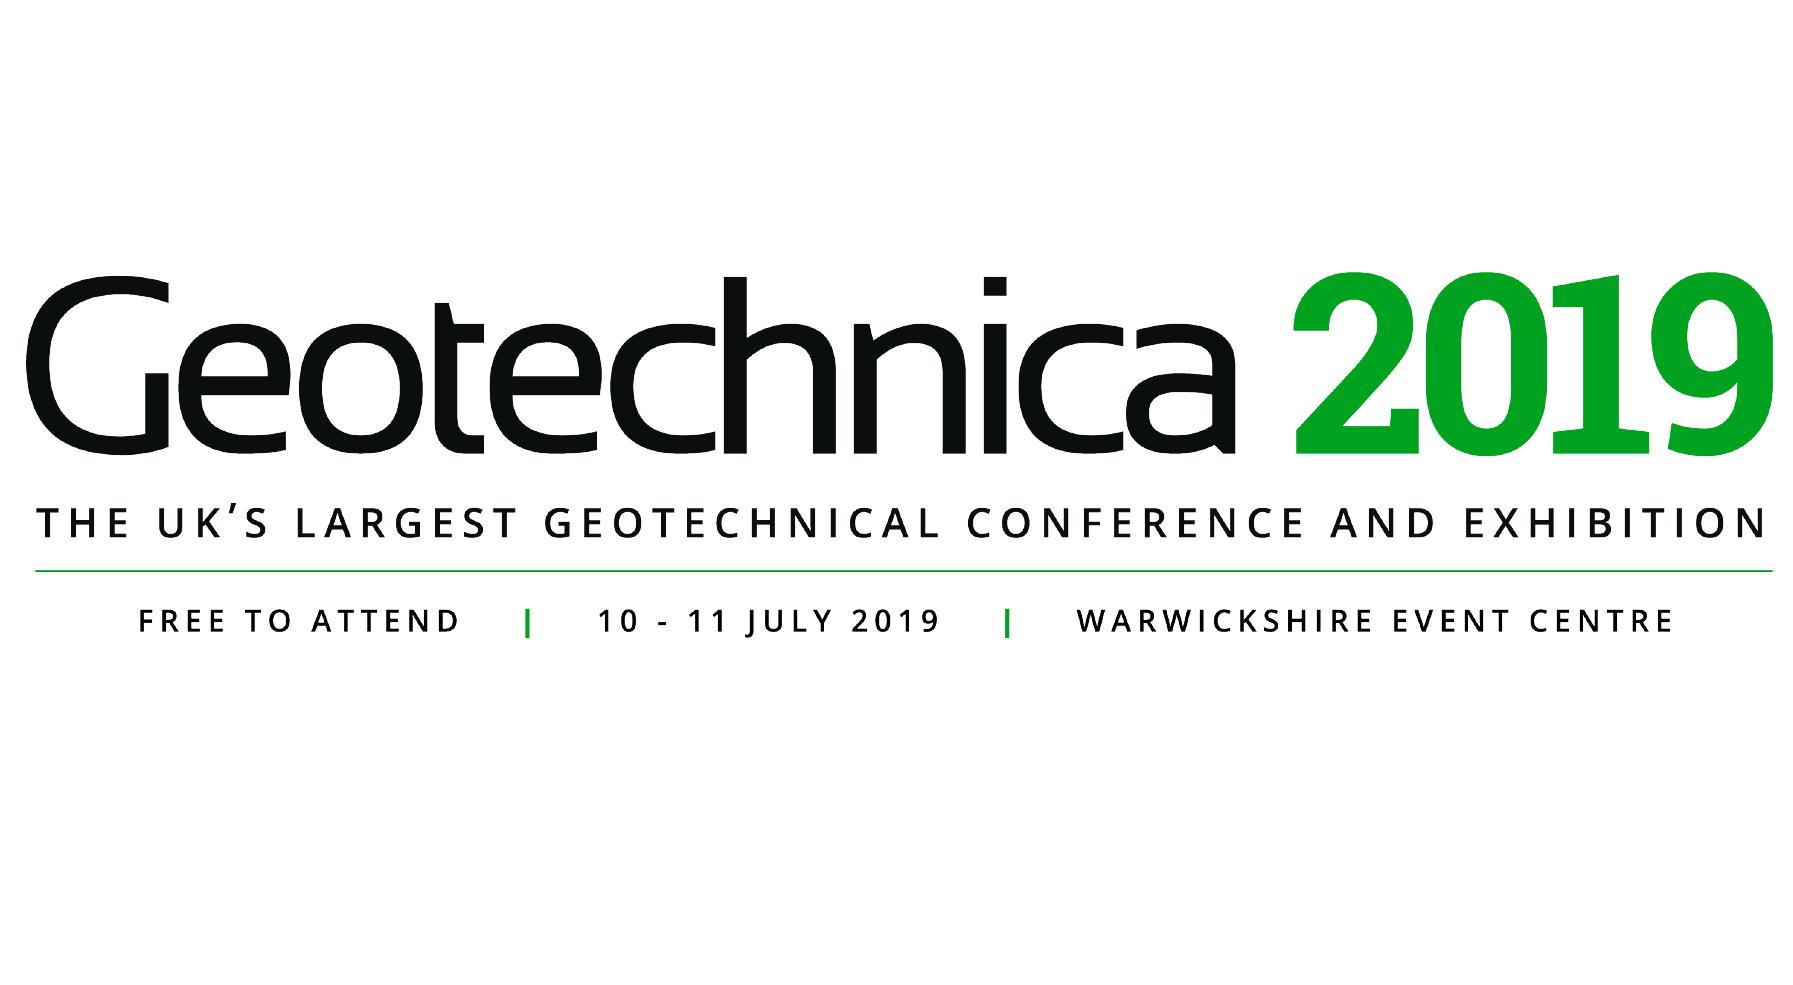 fielddata.io GmbH participates in Geotechnica 2019 in Warwickshire